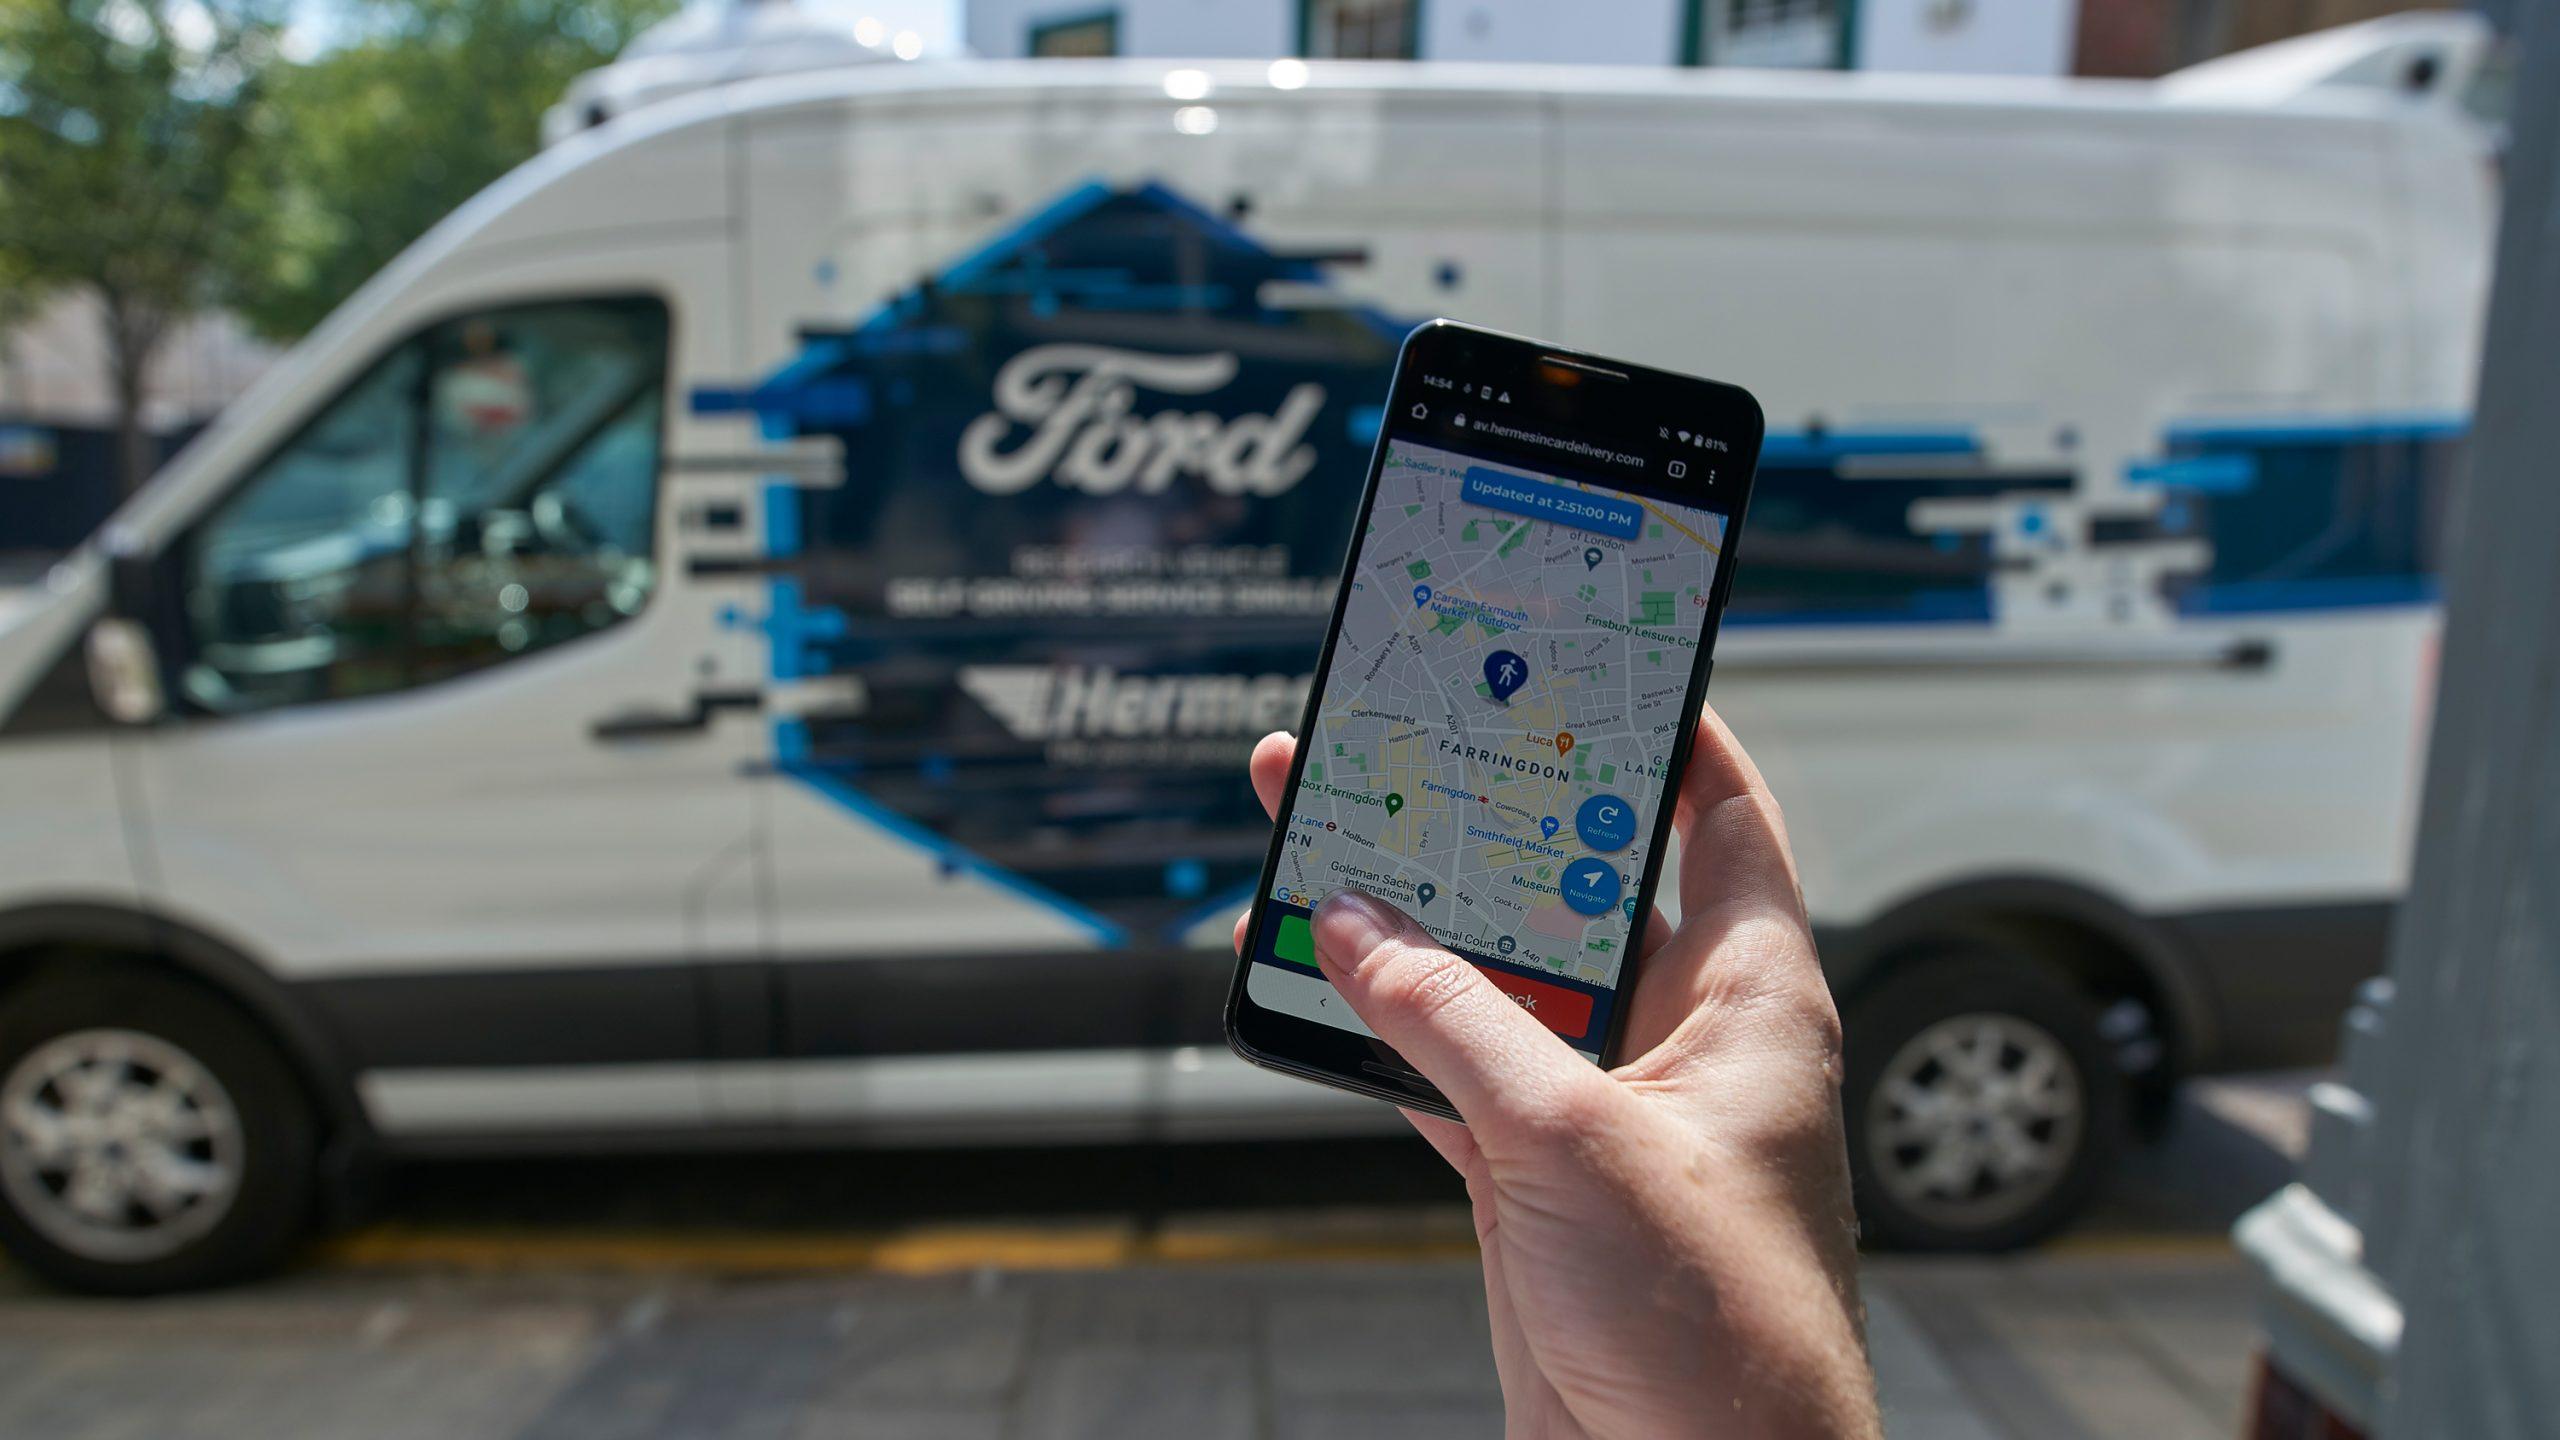 SHOT 08 AV Tease App 16 9 scaled Θα εμπιστευόσουν τα δέματά σου, σε ένα van χωρίς οδηγό; Ford, Ford Transit, ειδήσεις, Επαγγελματικά, Νέα